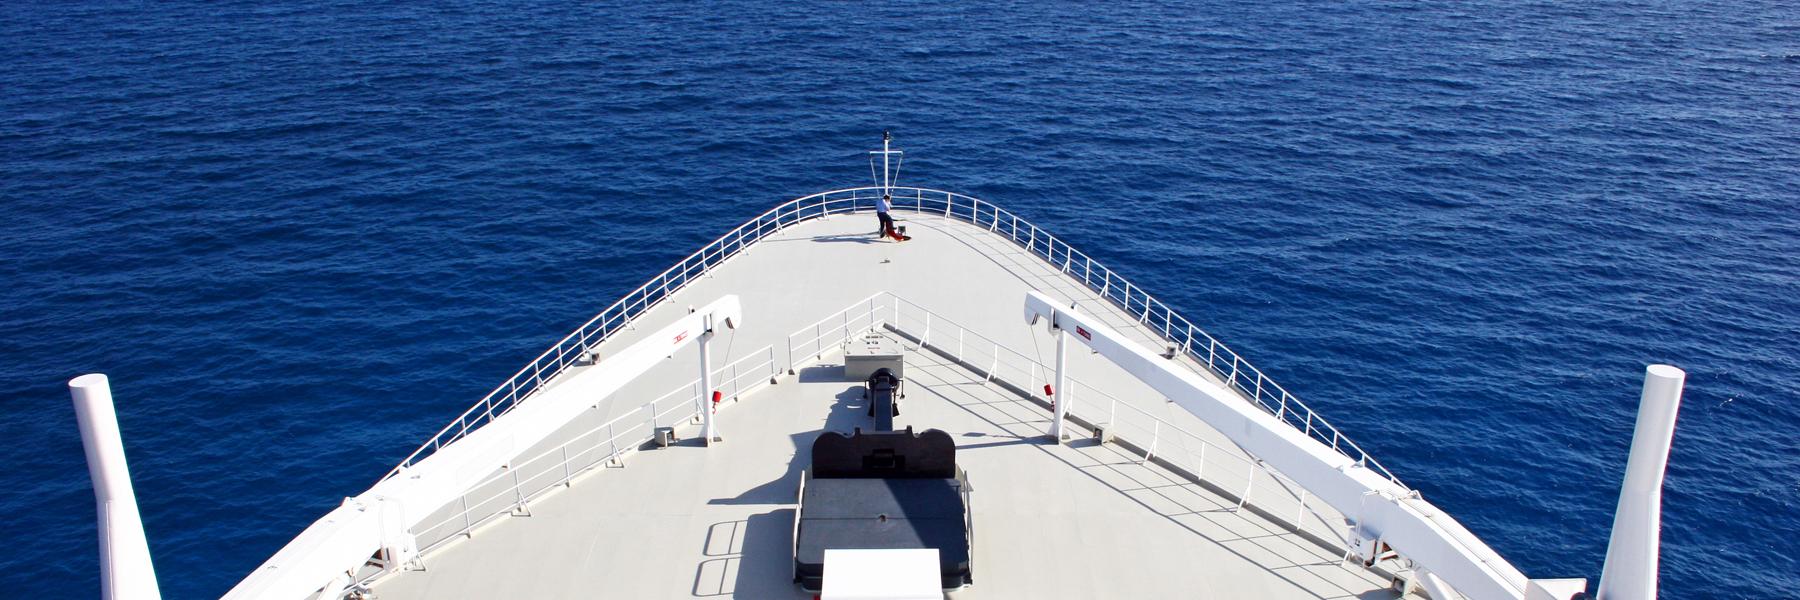 AIS Vessel Monitoring